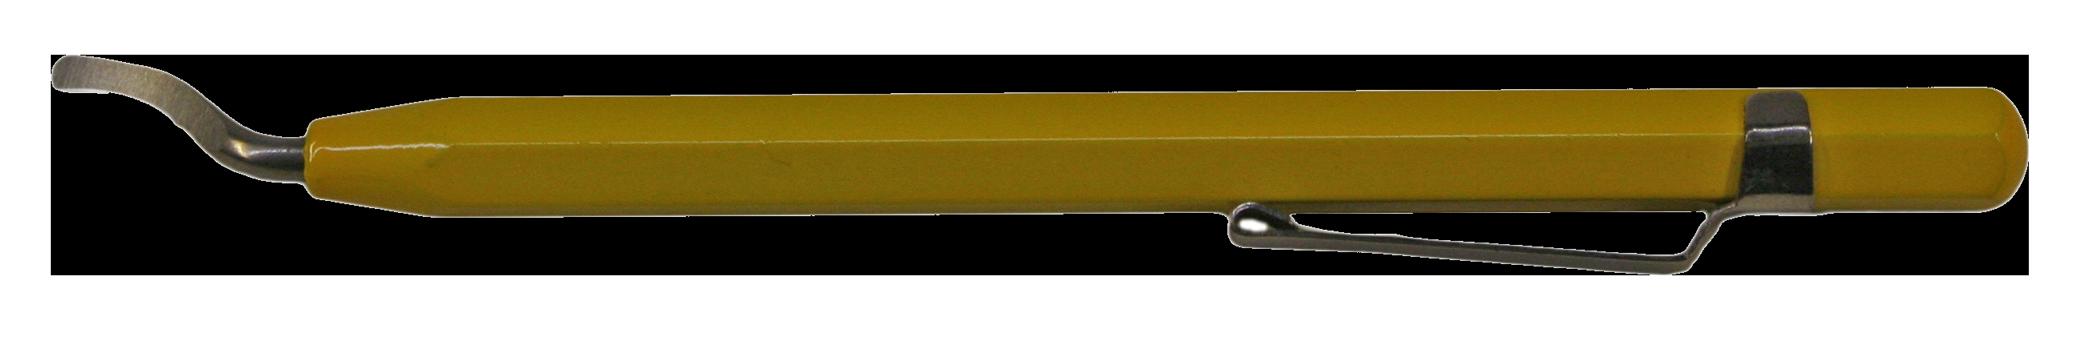 ALU-Handgriff <br/>E100 inox, fix Image